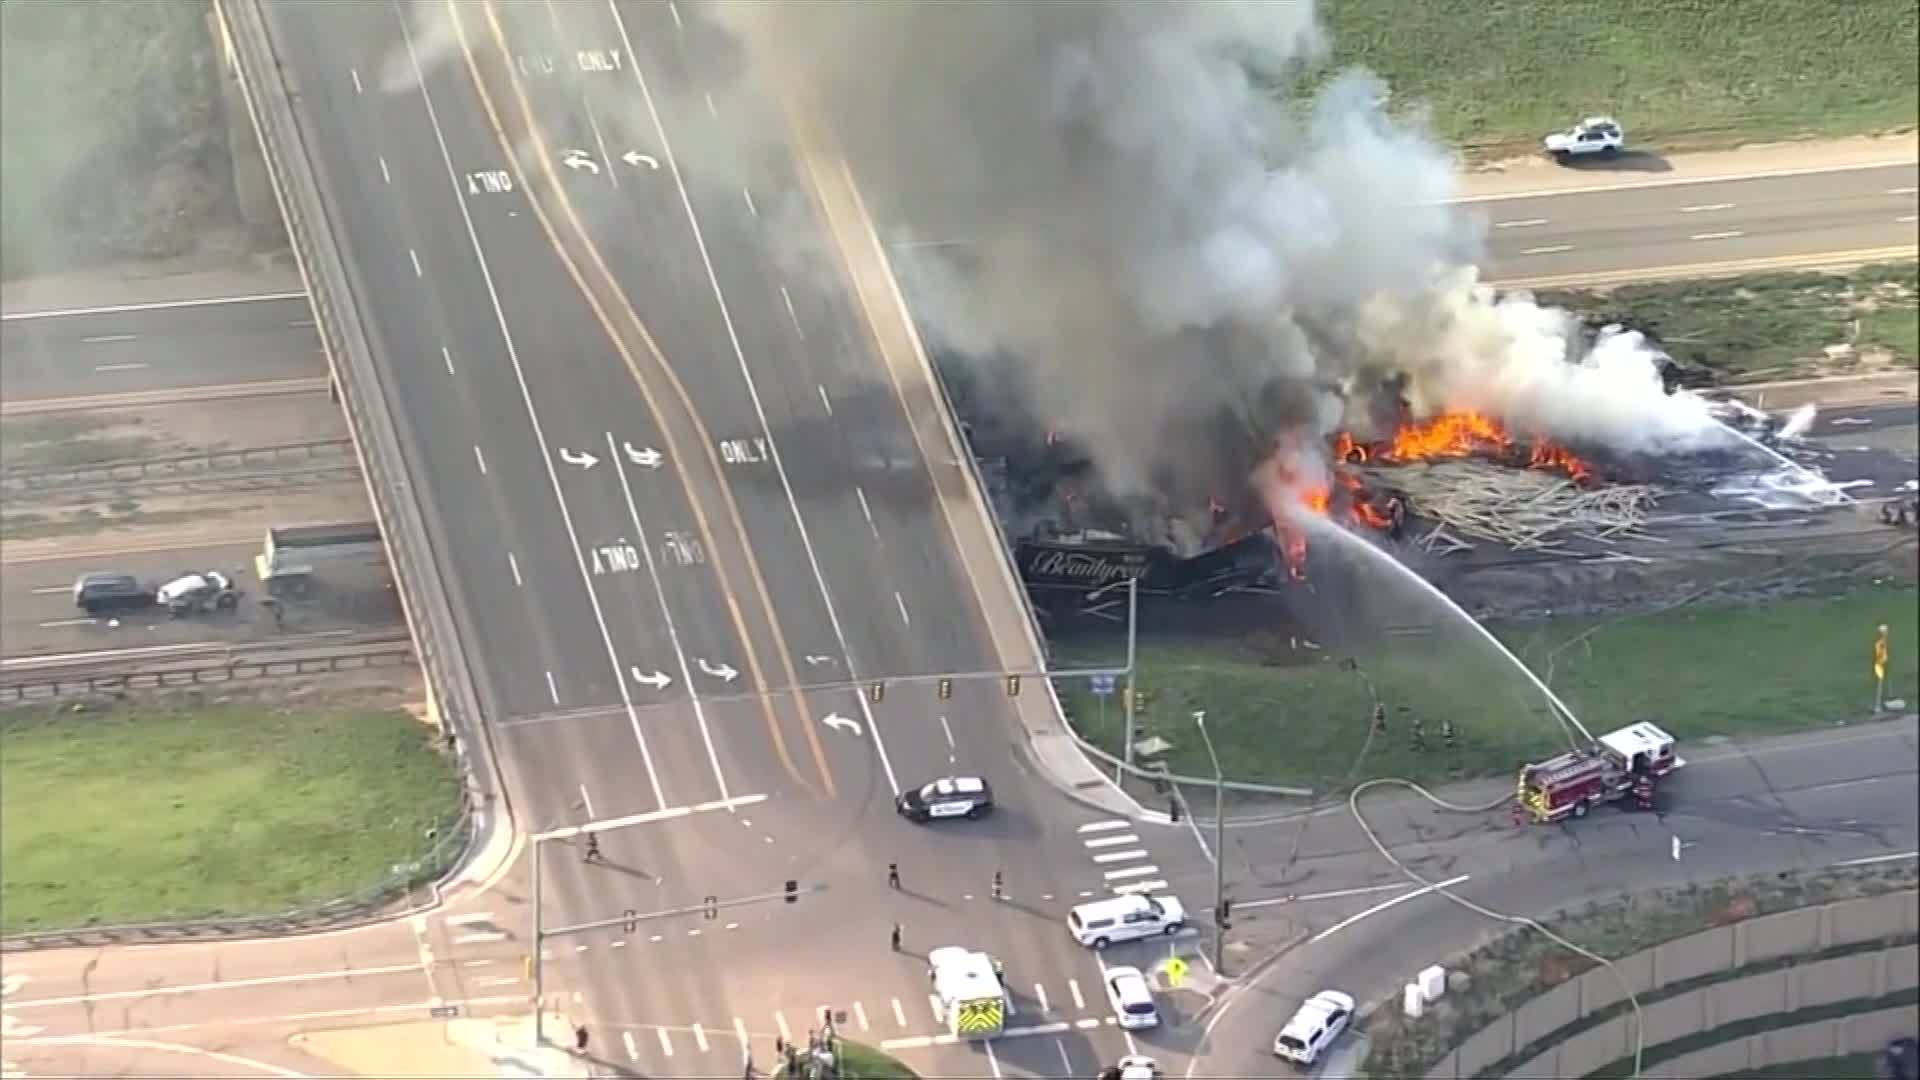 Vehicles_burn_in_massive_fire_on_Interst_2_20190425234105